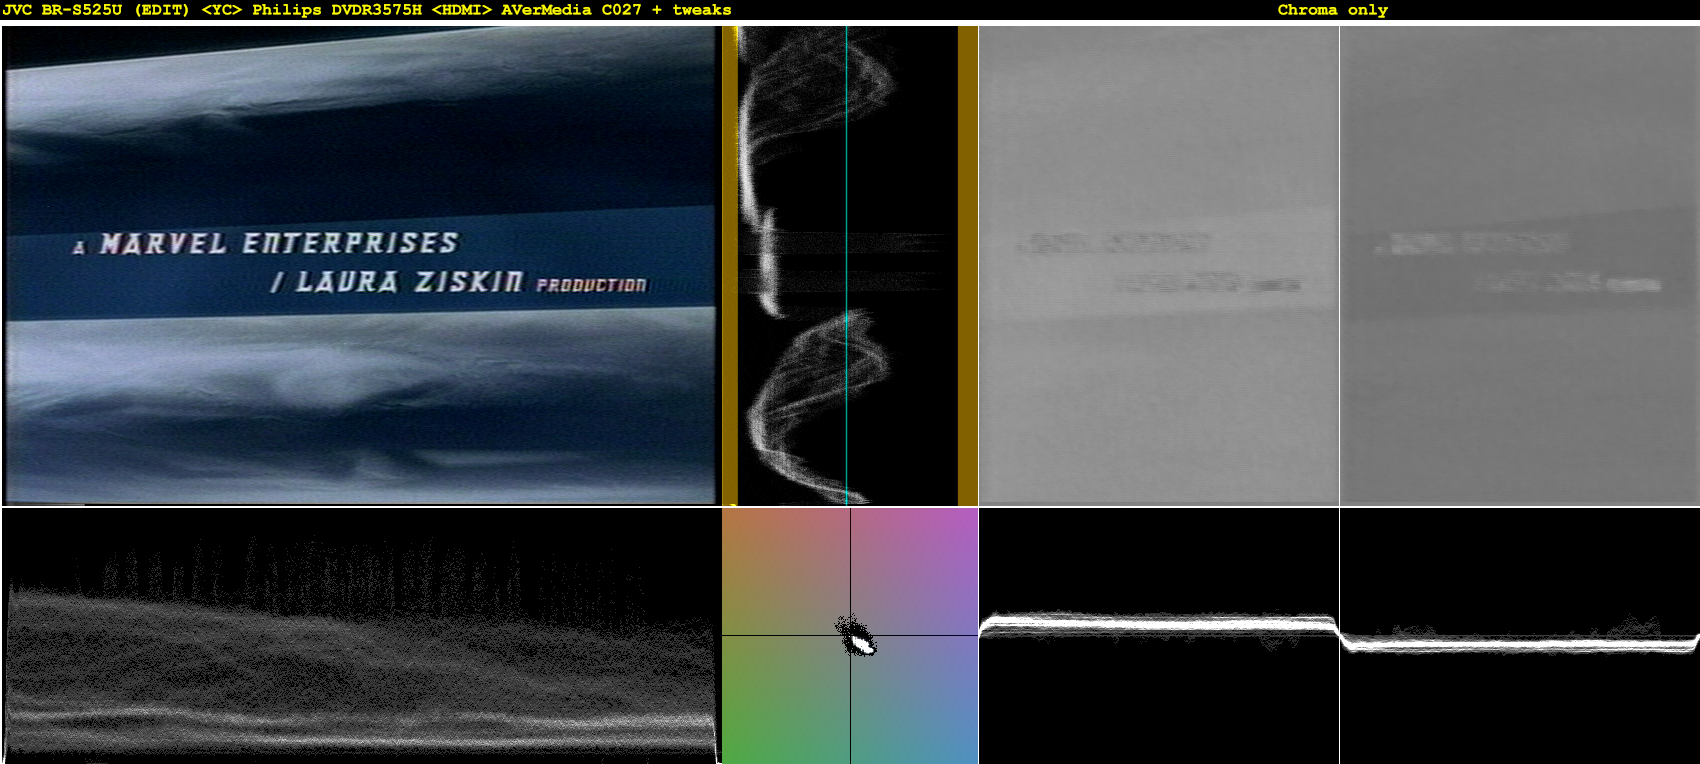 Click image for larger version  Name:0-09-01 - JVC BR-S525U (EDIT).png Views:1208 Size:931.4 KB ID:37665